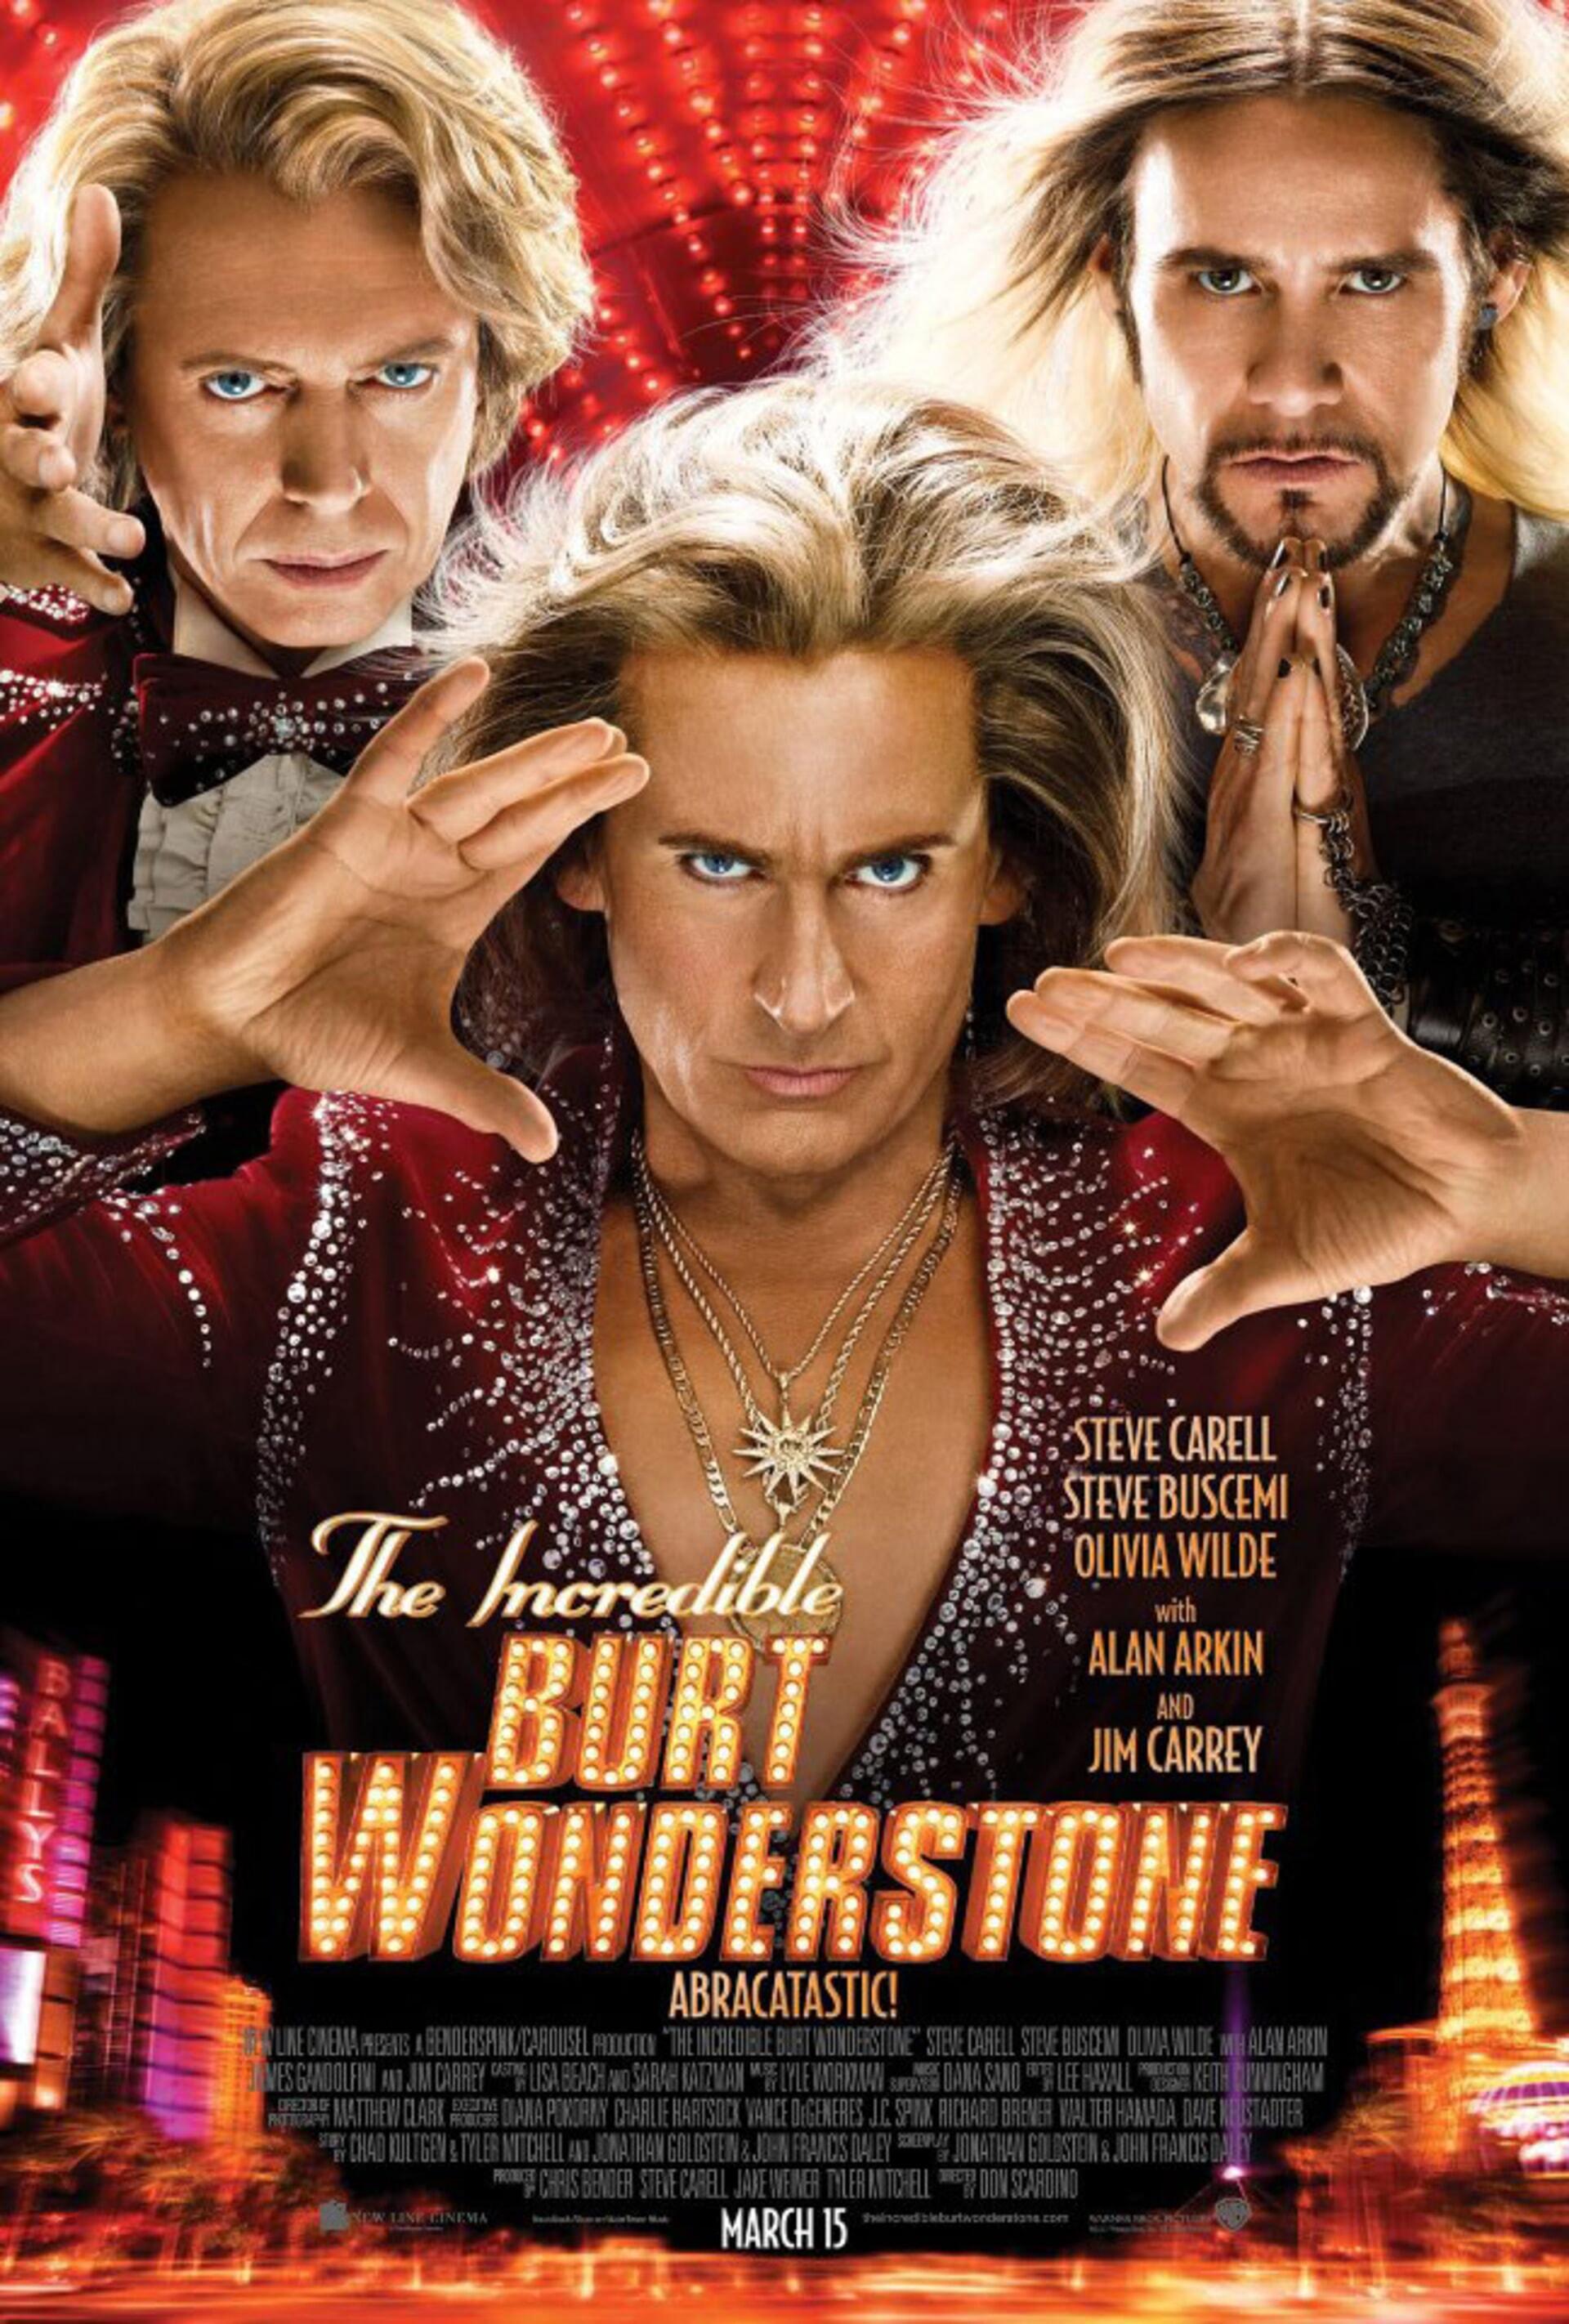 The Incredible Burt Wonderstone - Poster 1